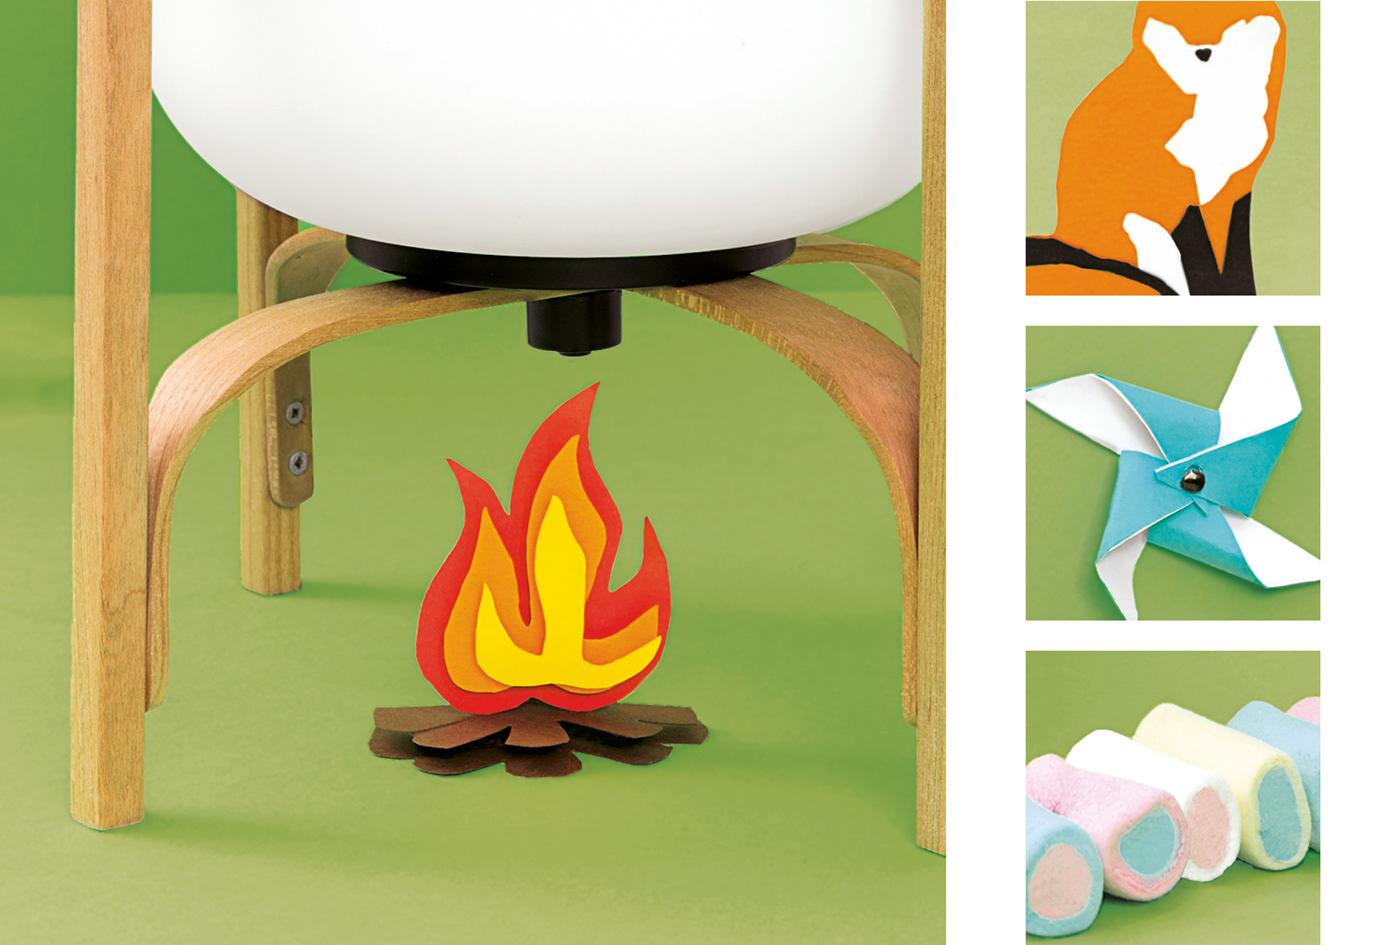 set design  Trompe Oeil imagination editorial Playful papercraft naif surrealism illusion Poetry